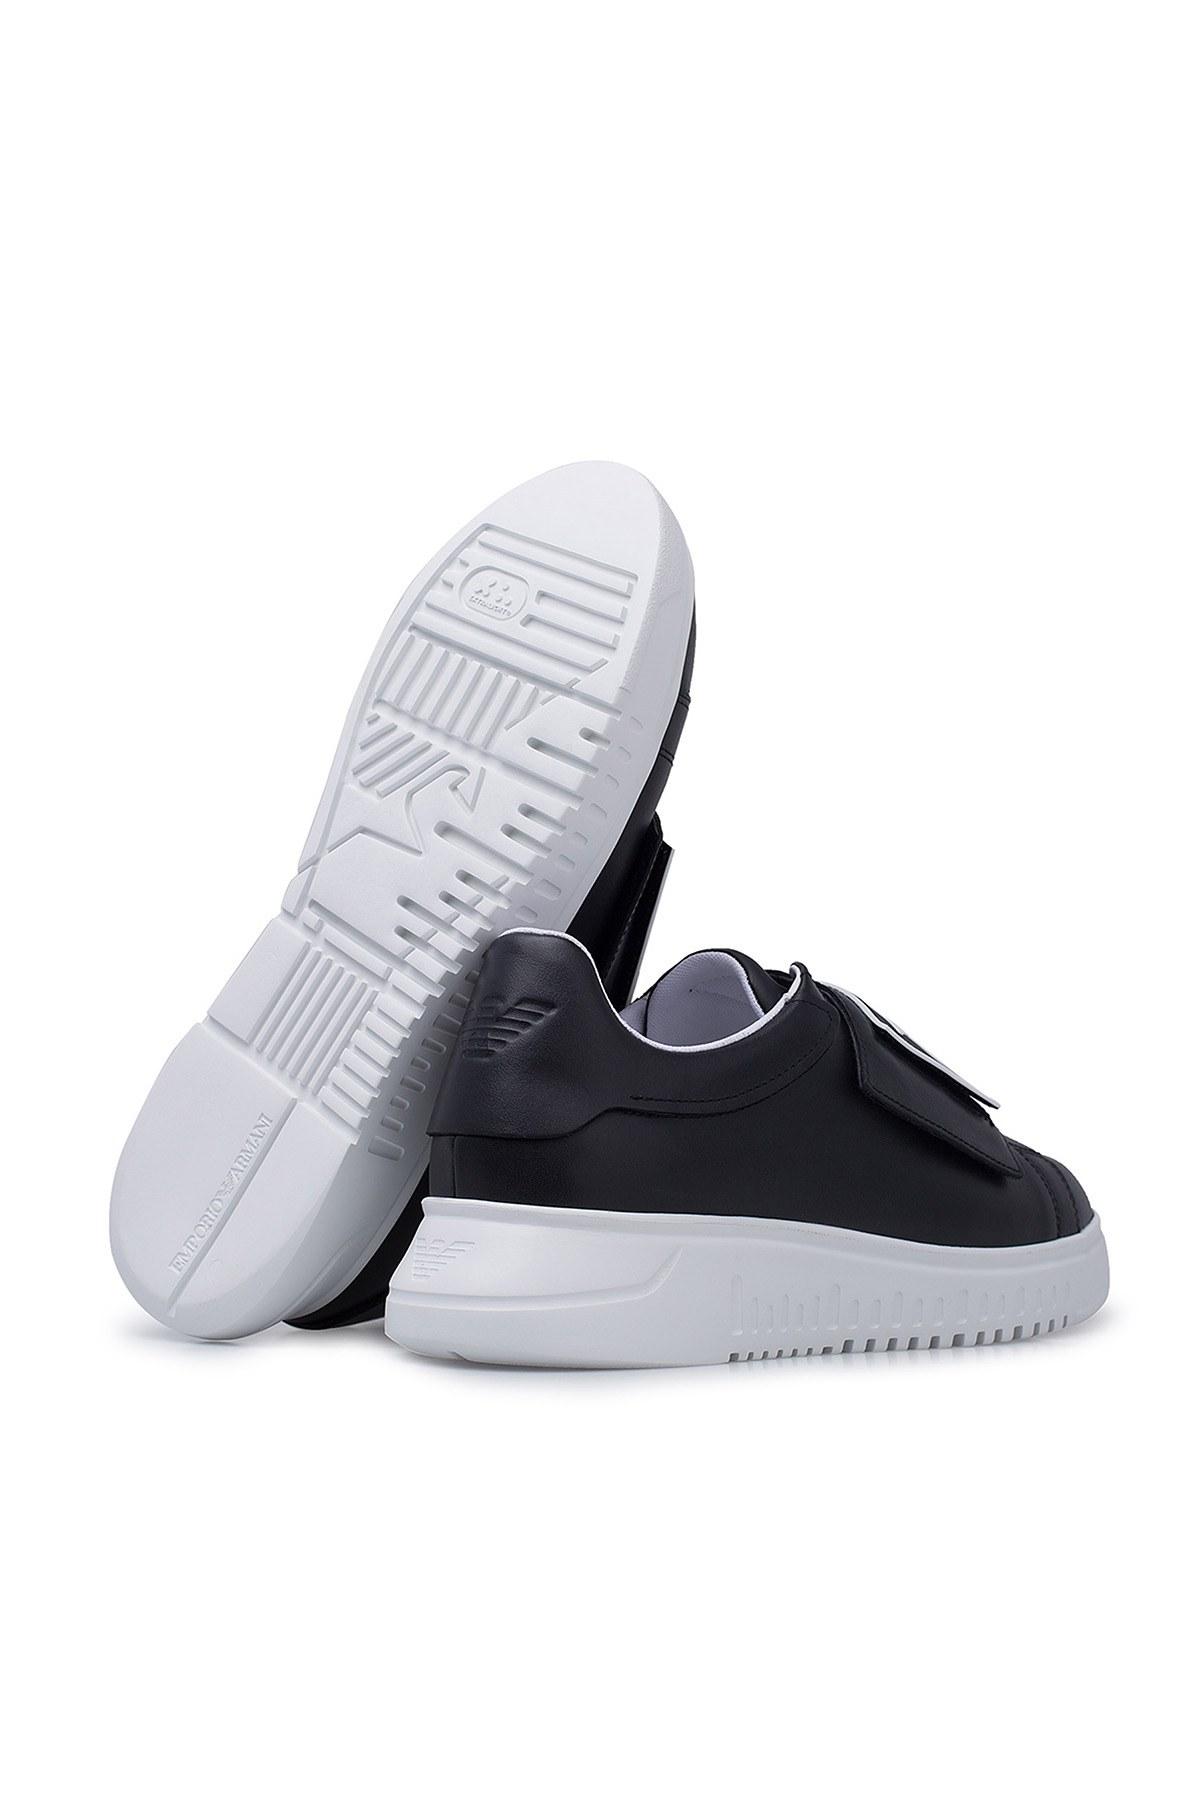 Emporio Armani Erkek Ayakkabı X4X300 XM320 A792 SİYAH